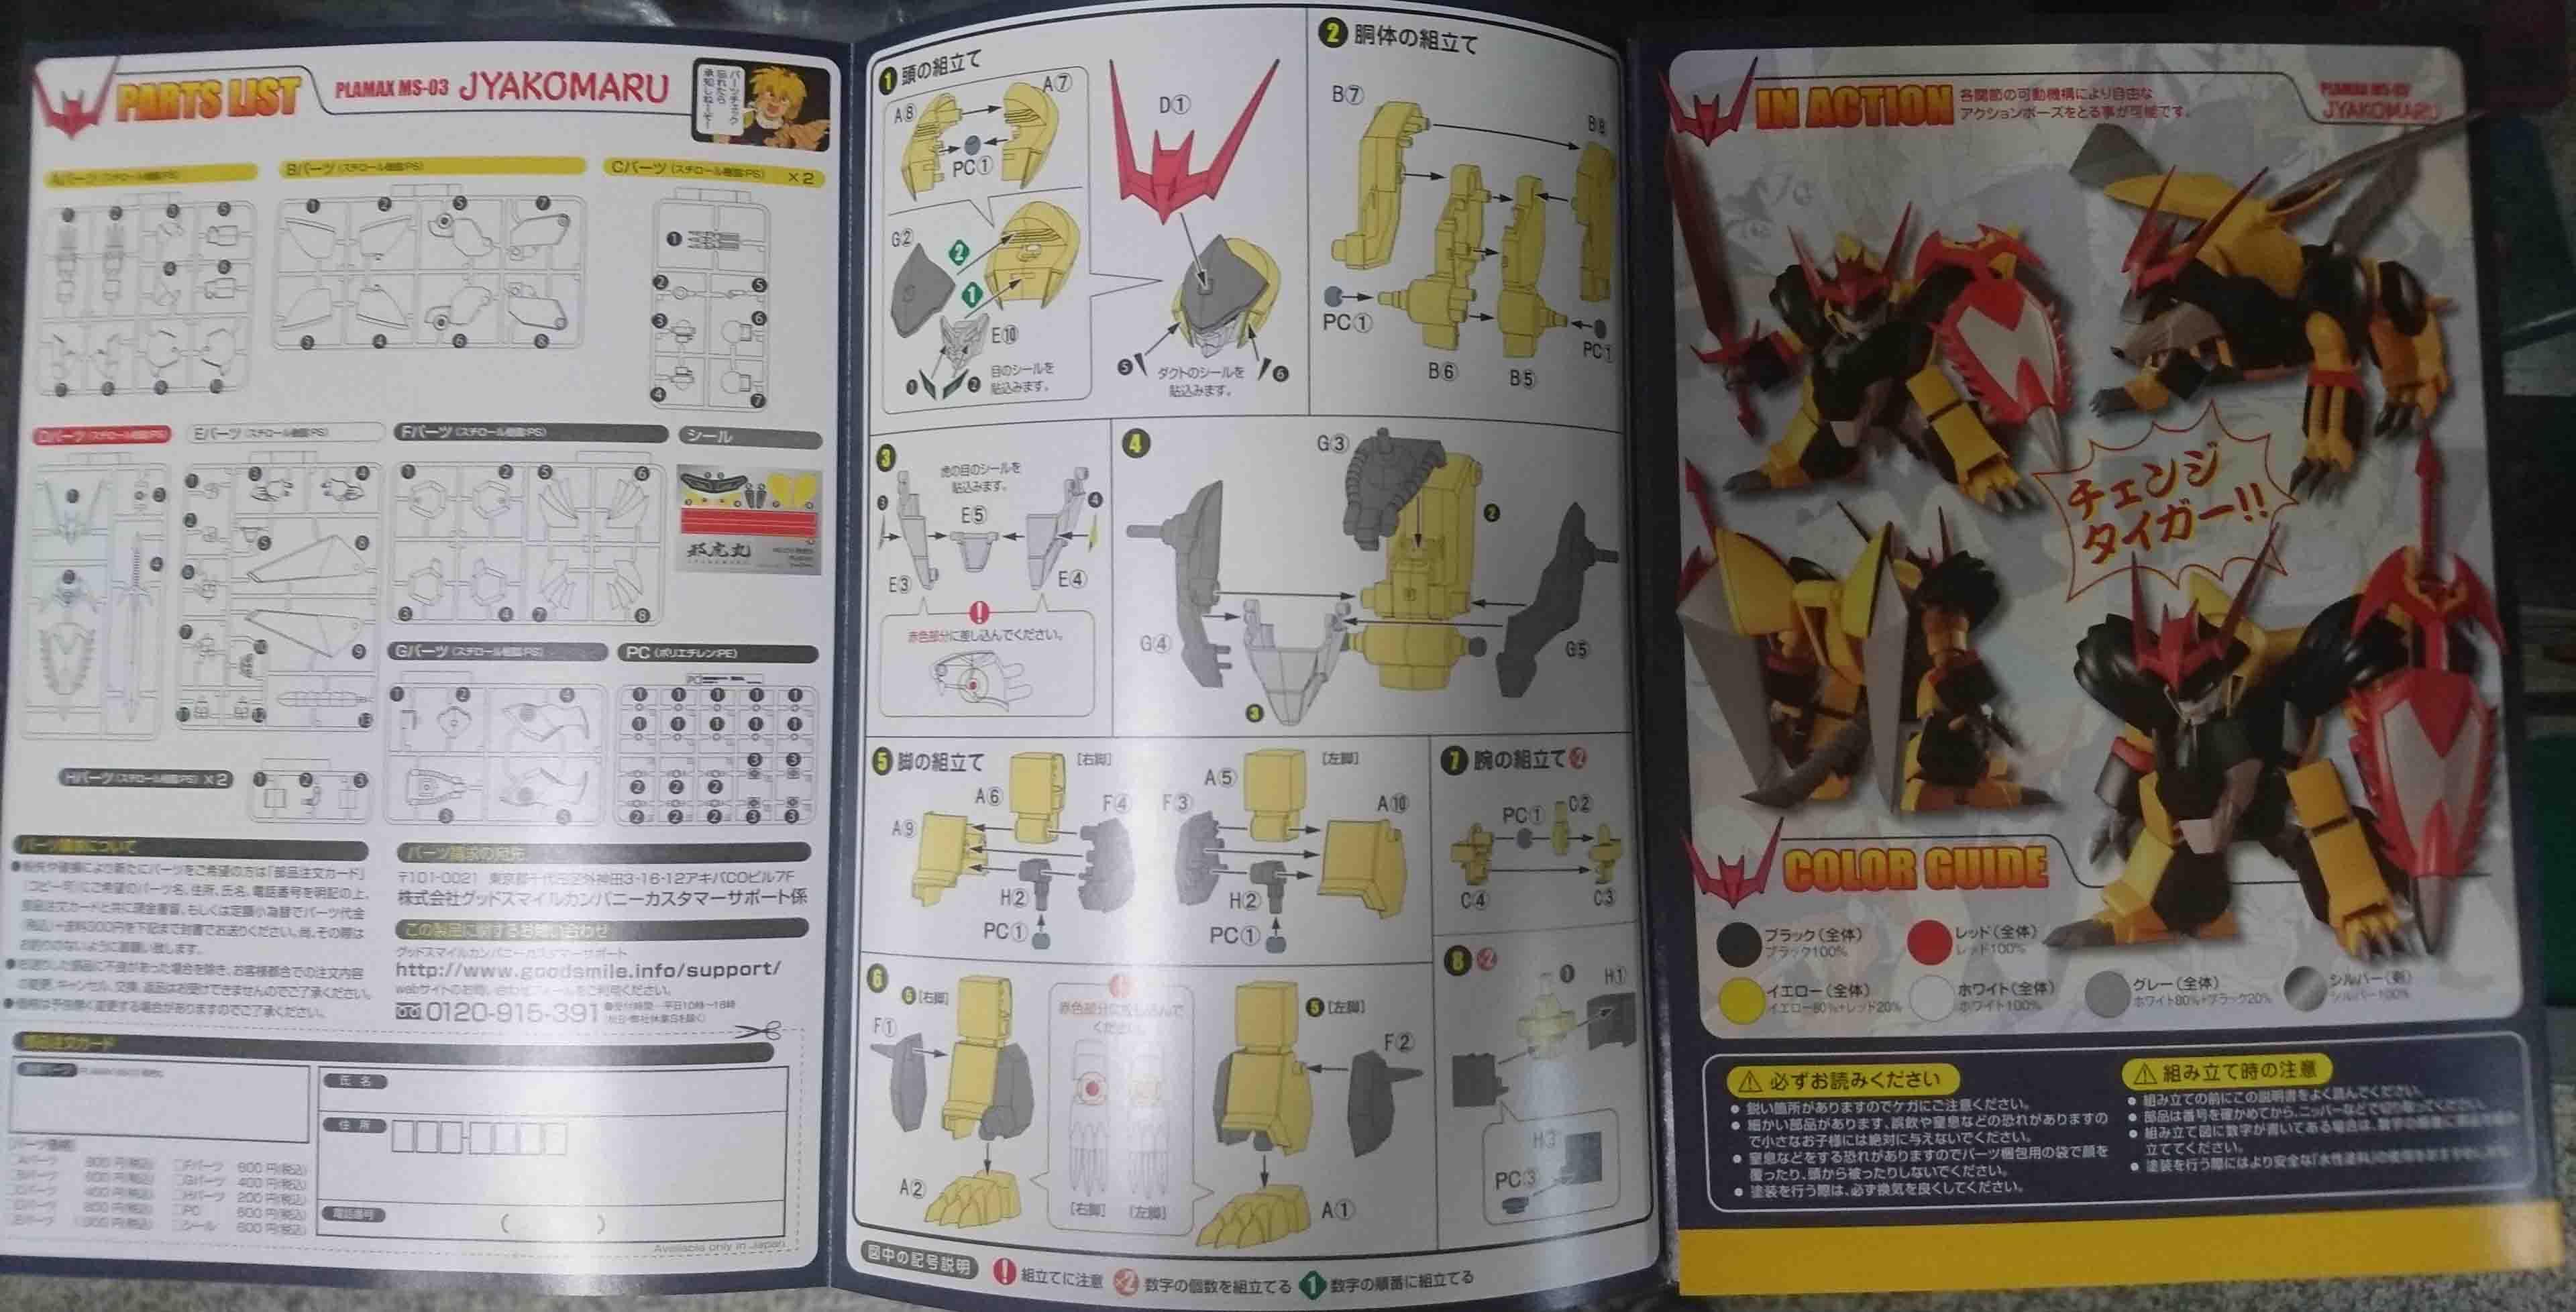 PLAMAX MS-03 邪虎丸,益祥模型玩具 說明書實際拍攝照片。